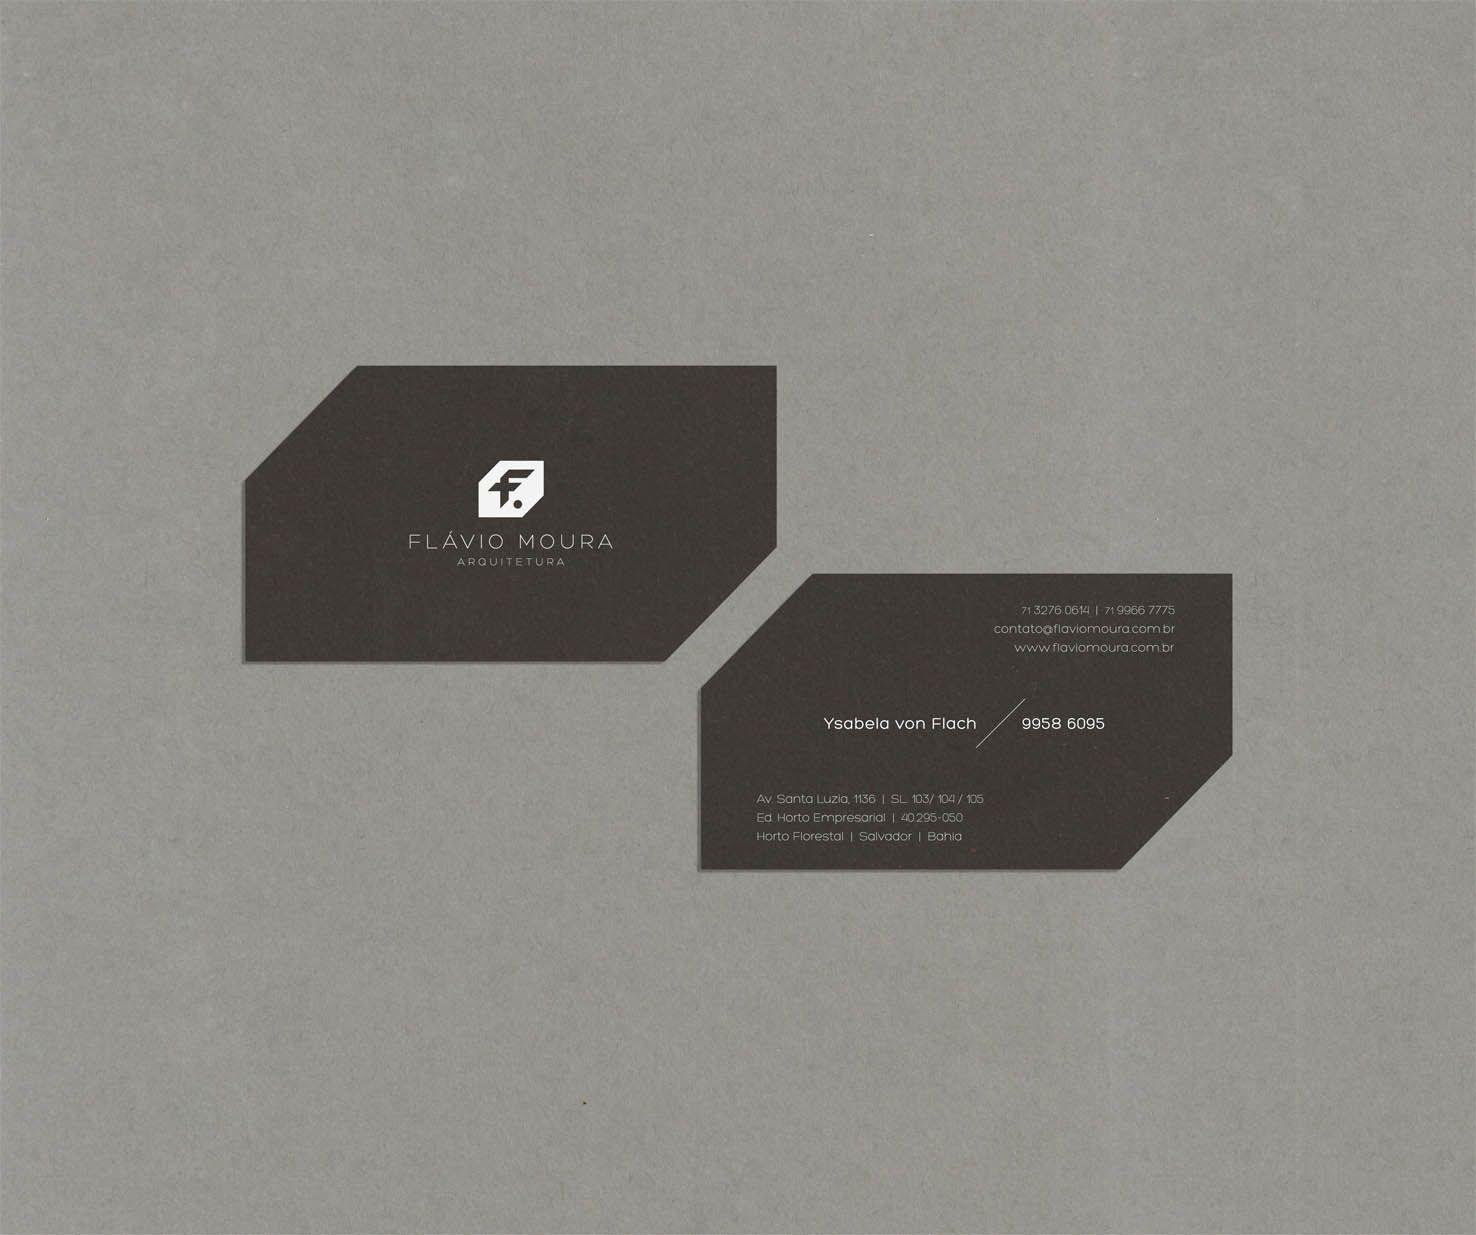 flavio-moura-arquitetura-cartao-de-visita